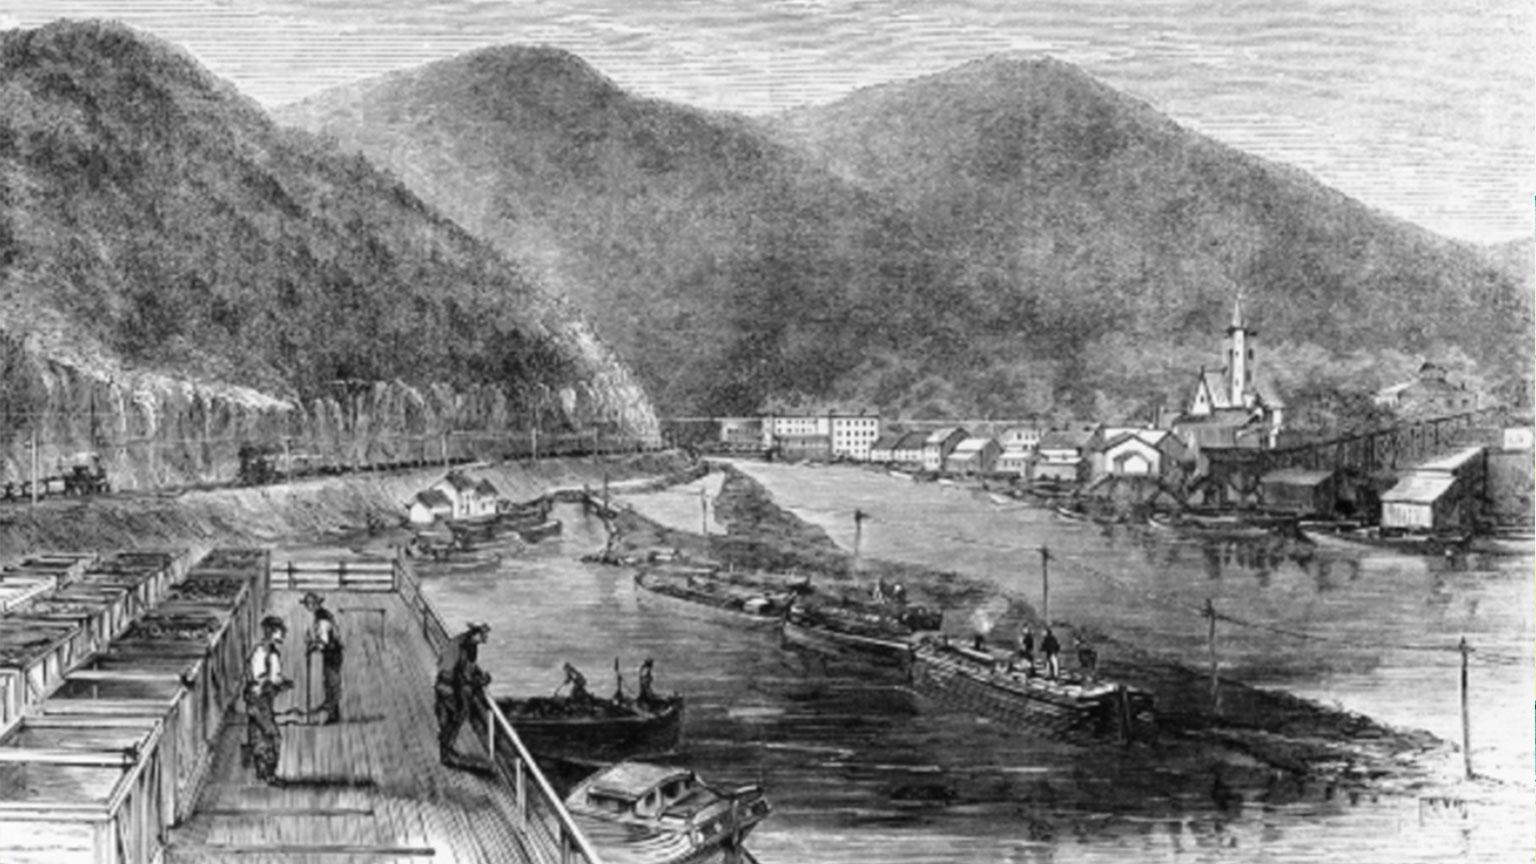 Mauch Chunk 1830s.